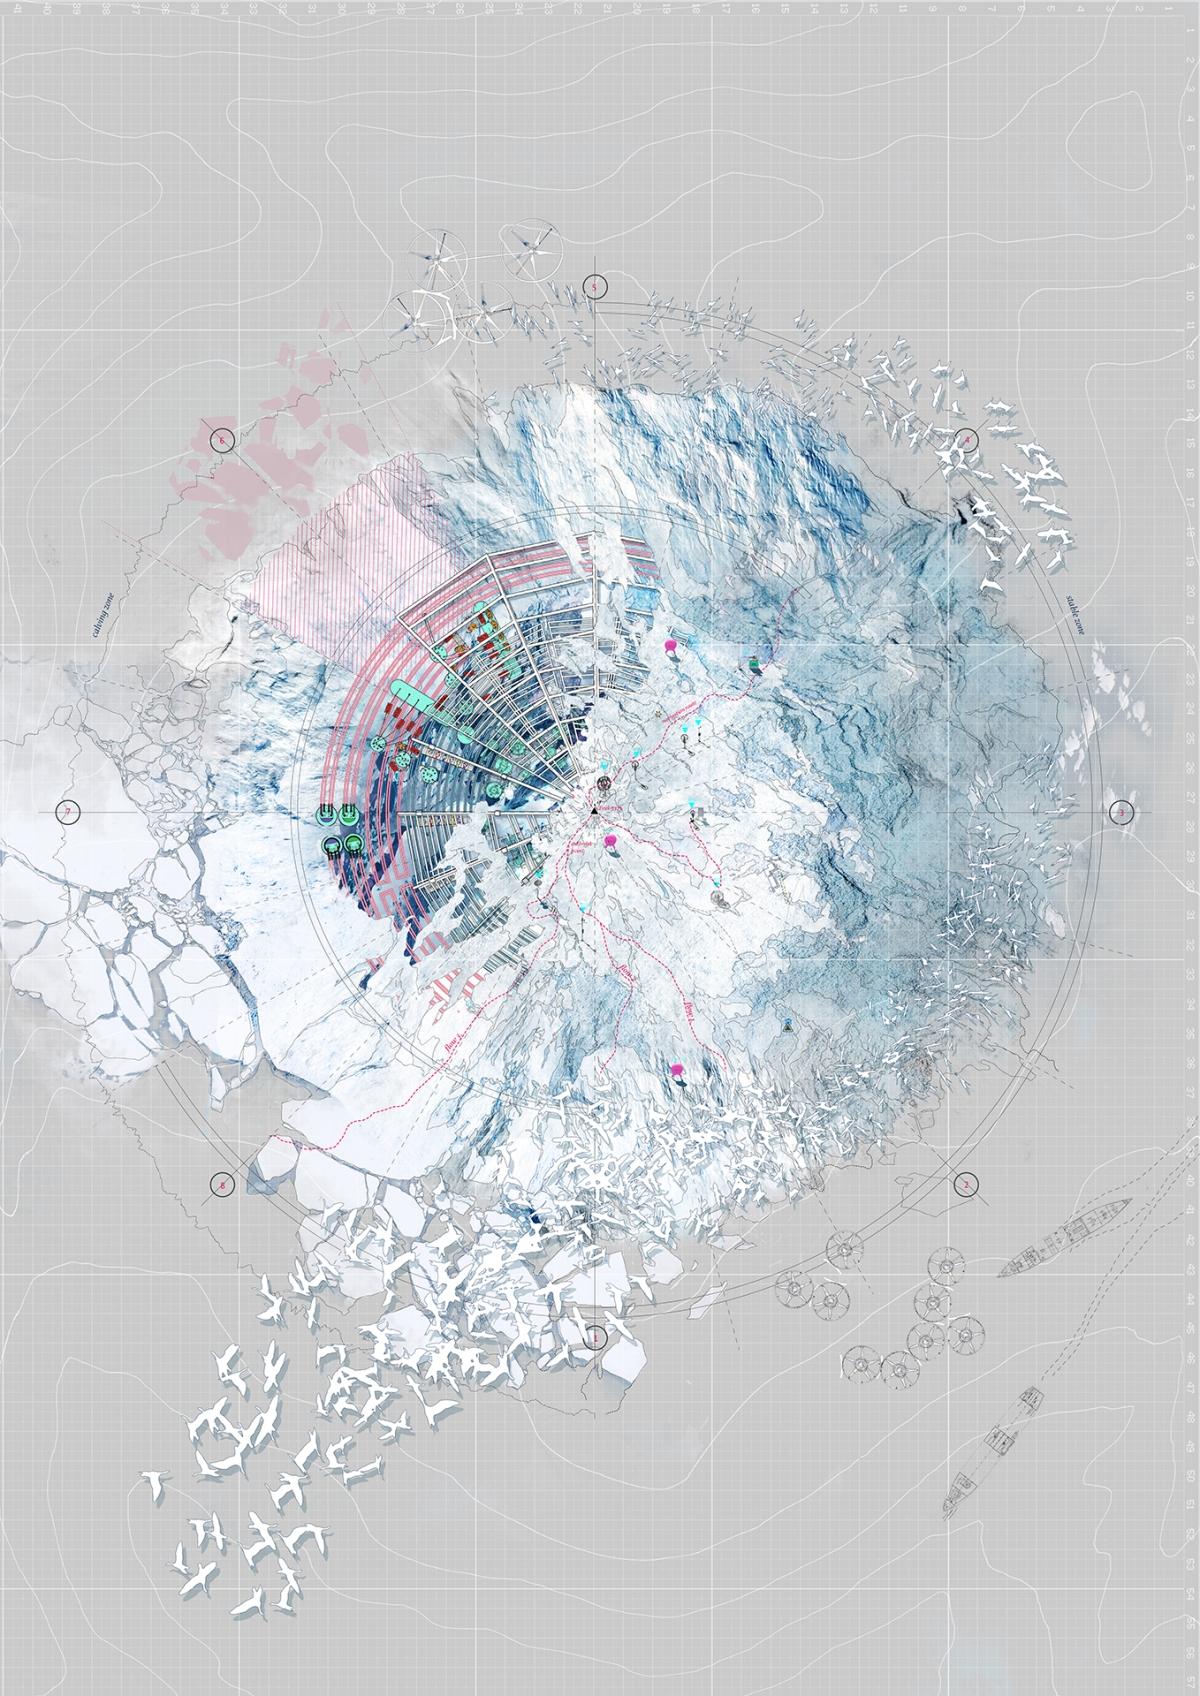 01 - Yufei Li - Iceberg_YL_1920